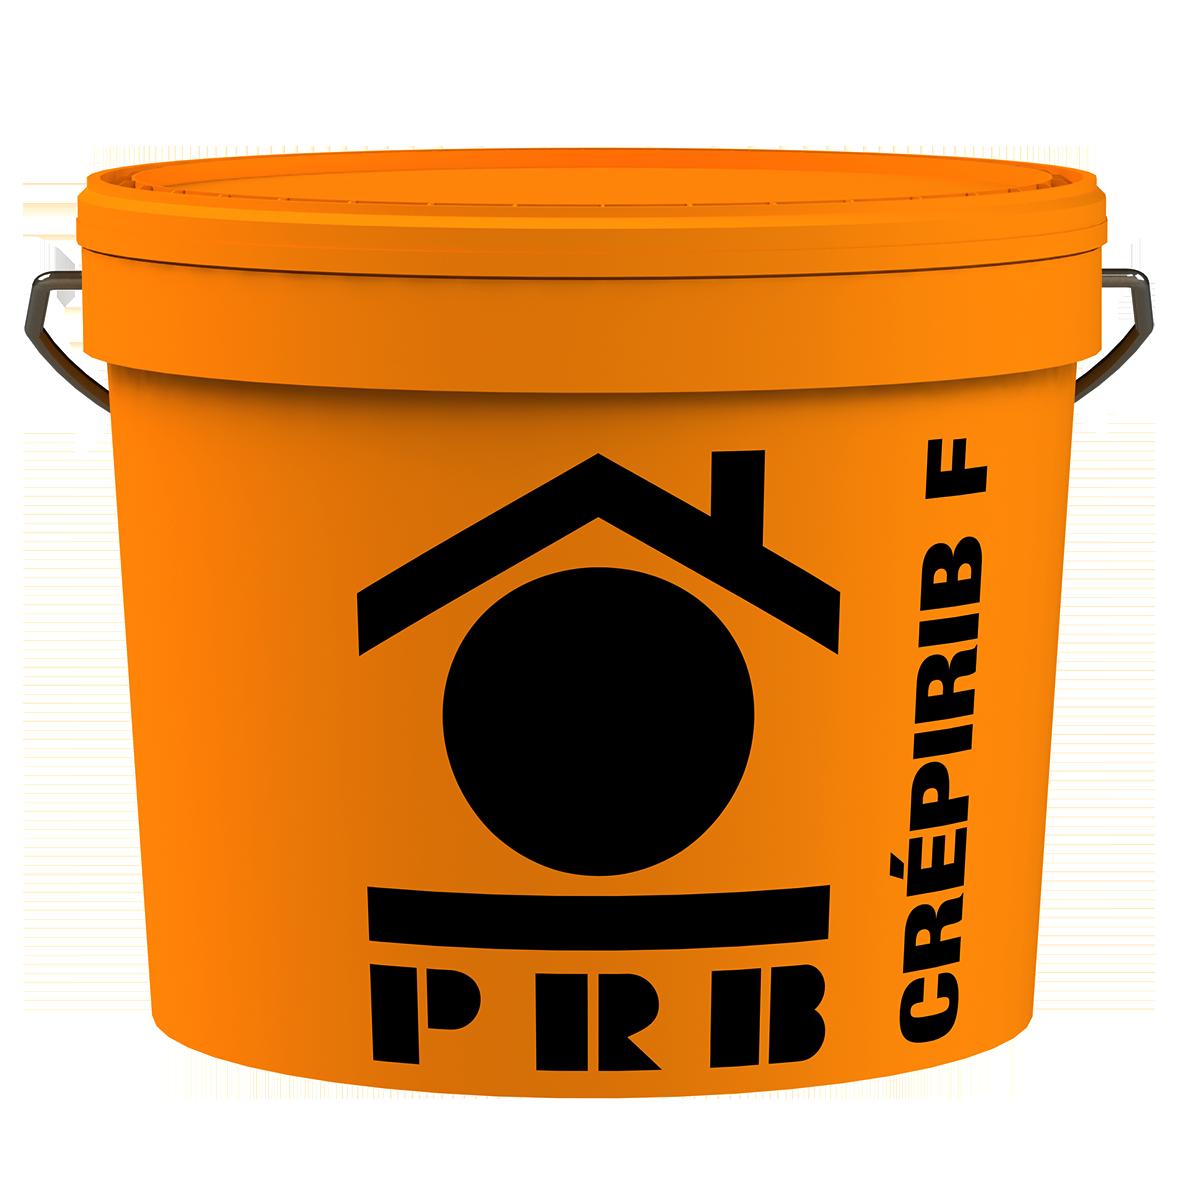 PRB CREPIRIB F 25 Kg